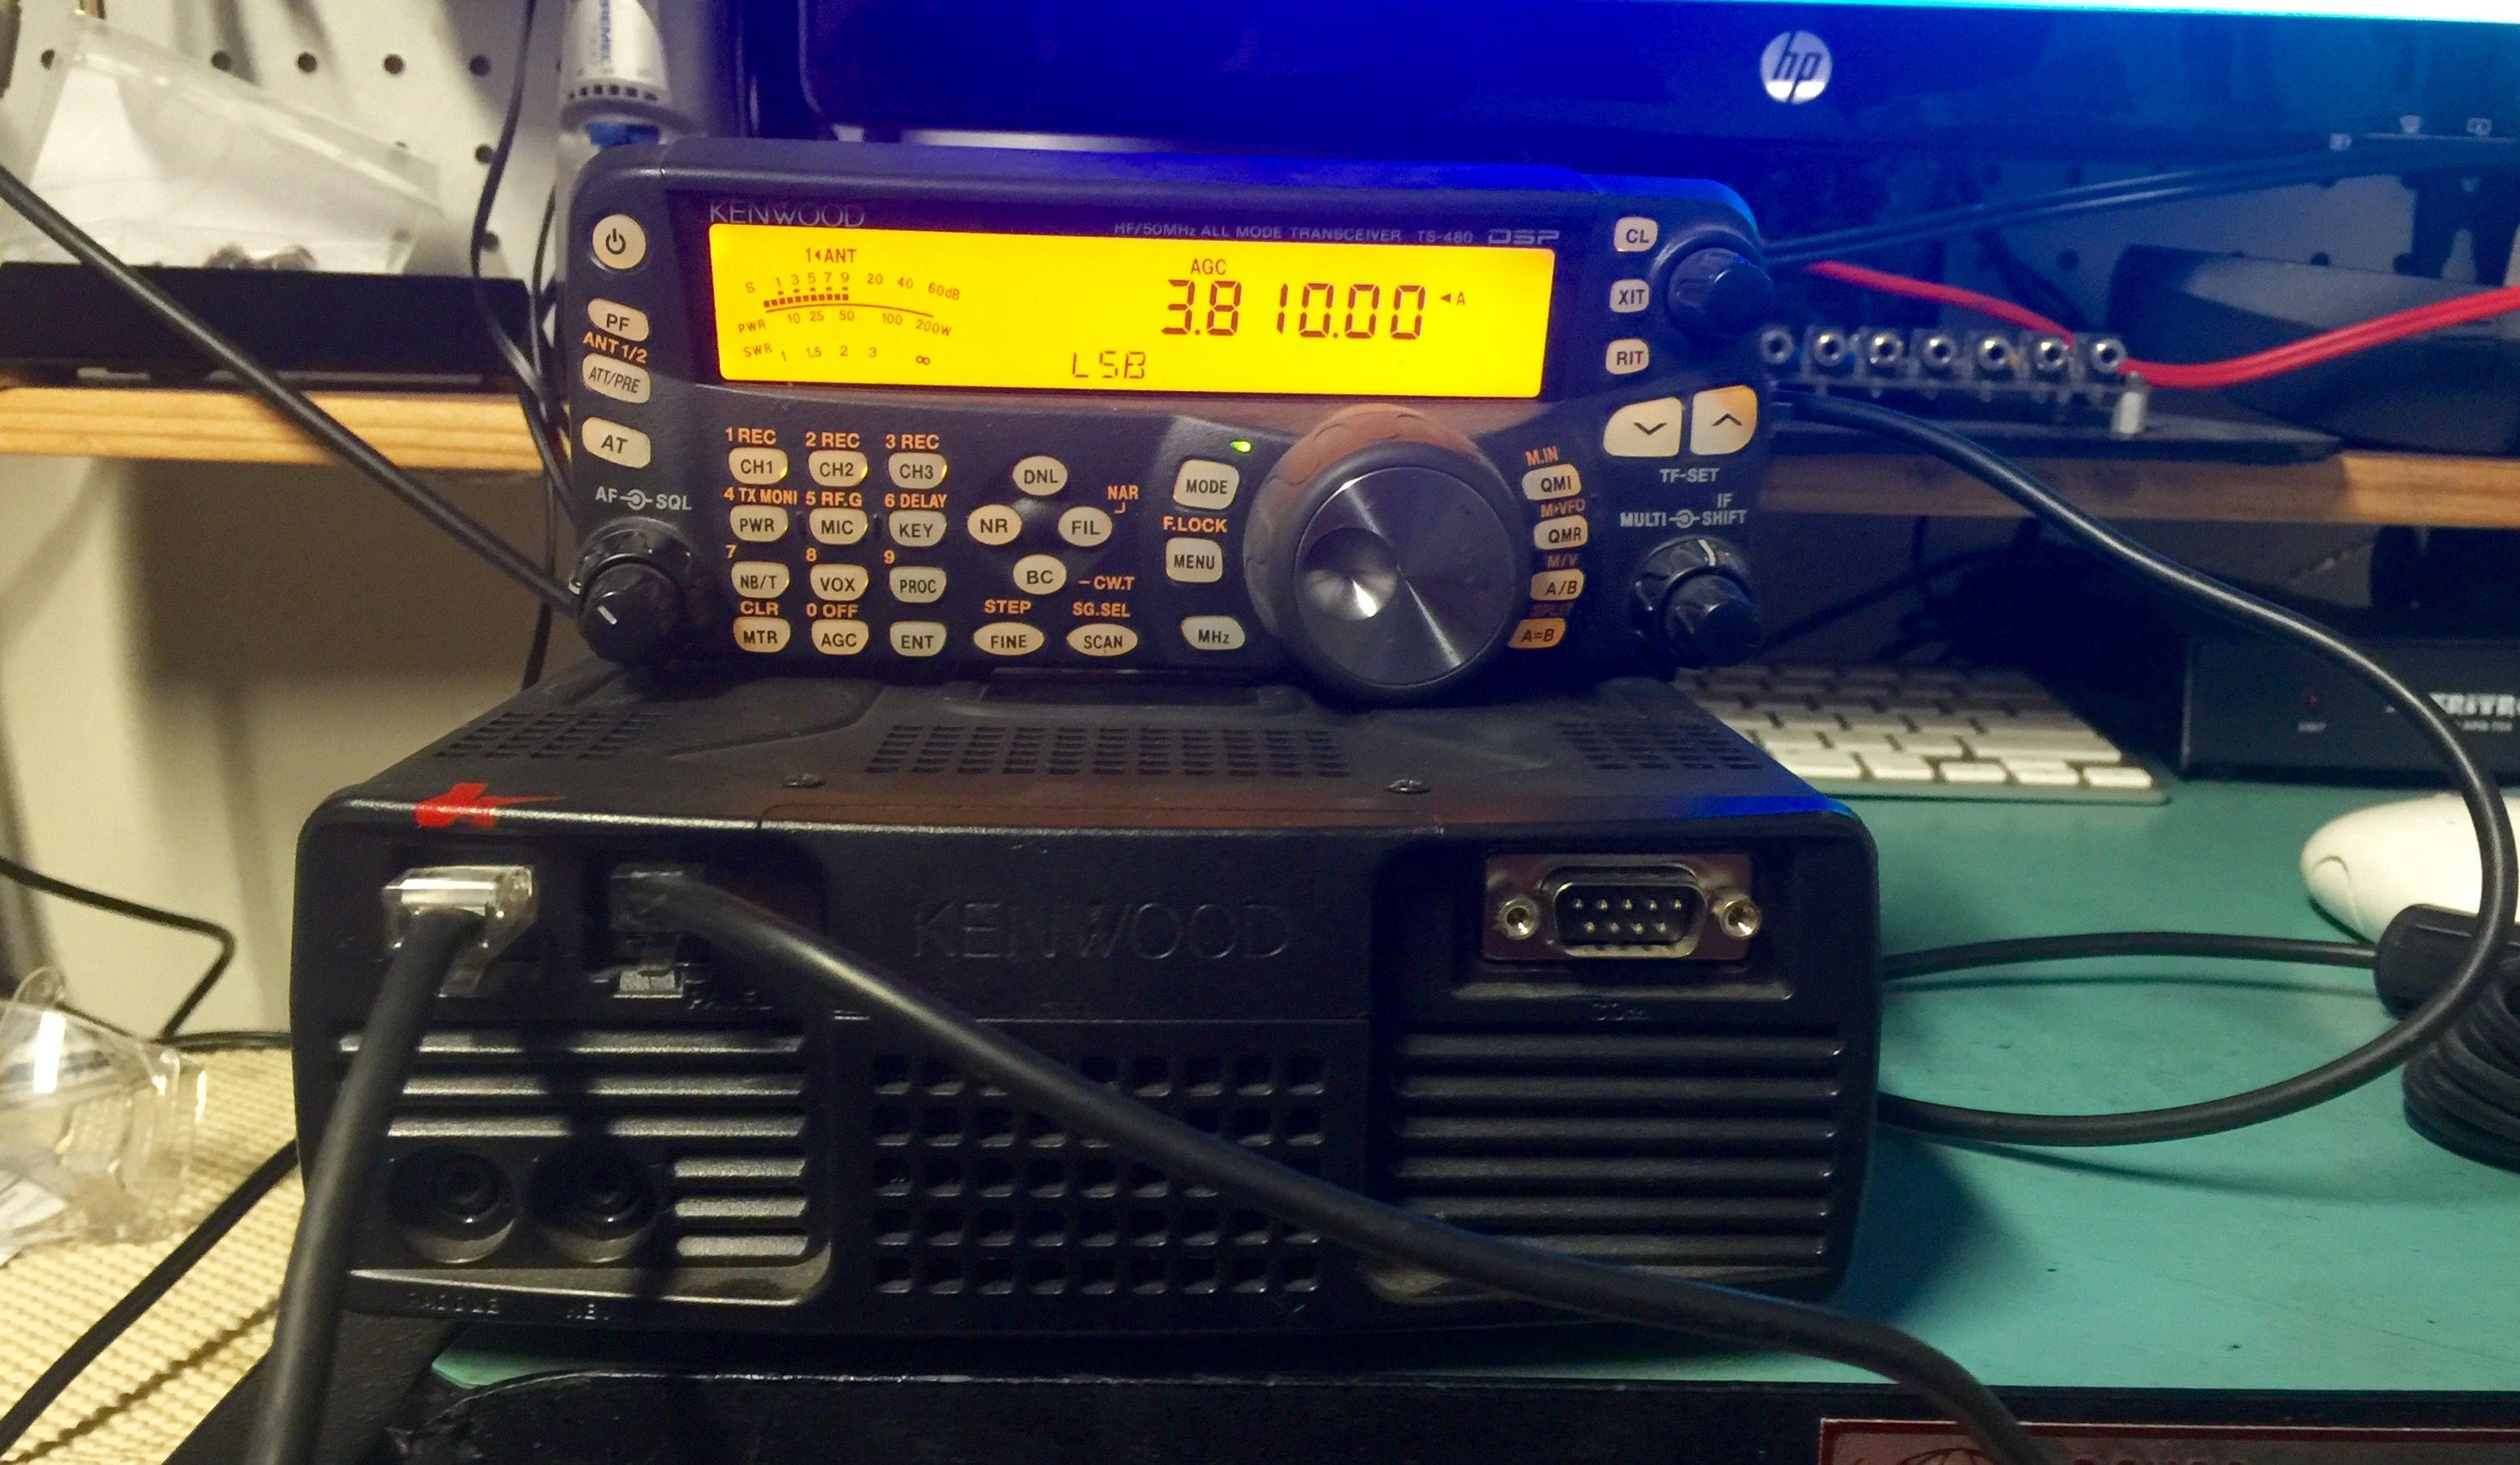 Kenwood TS 480 | AC6OT's/Ham Radio/SDR | Phone, Office phone